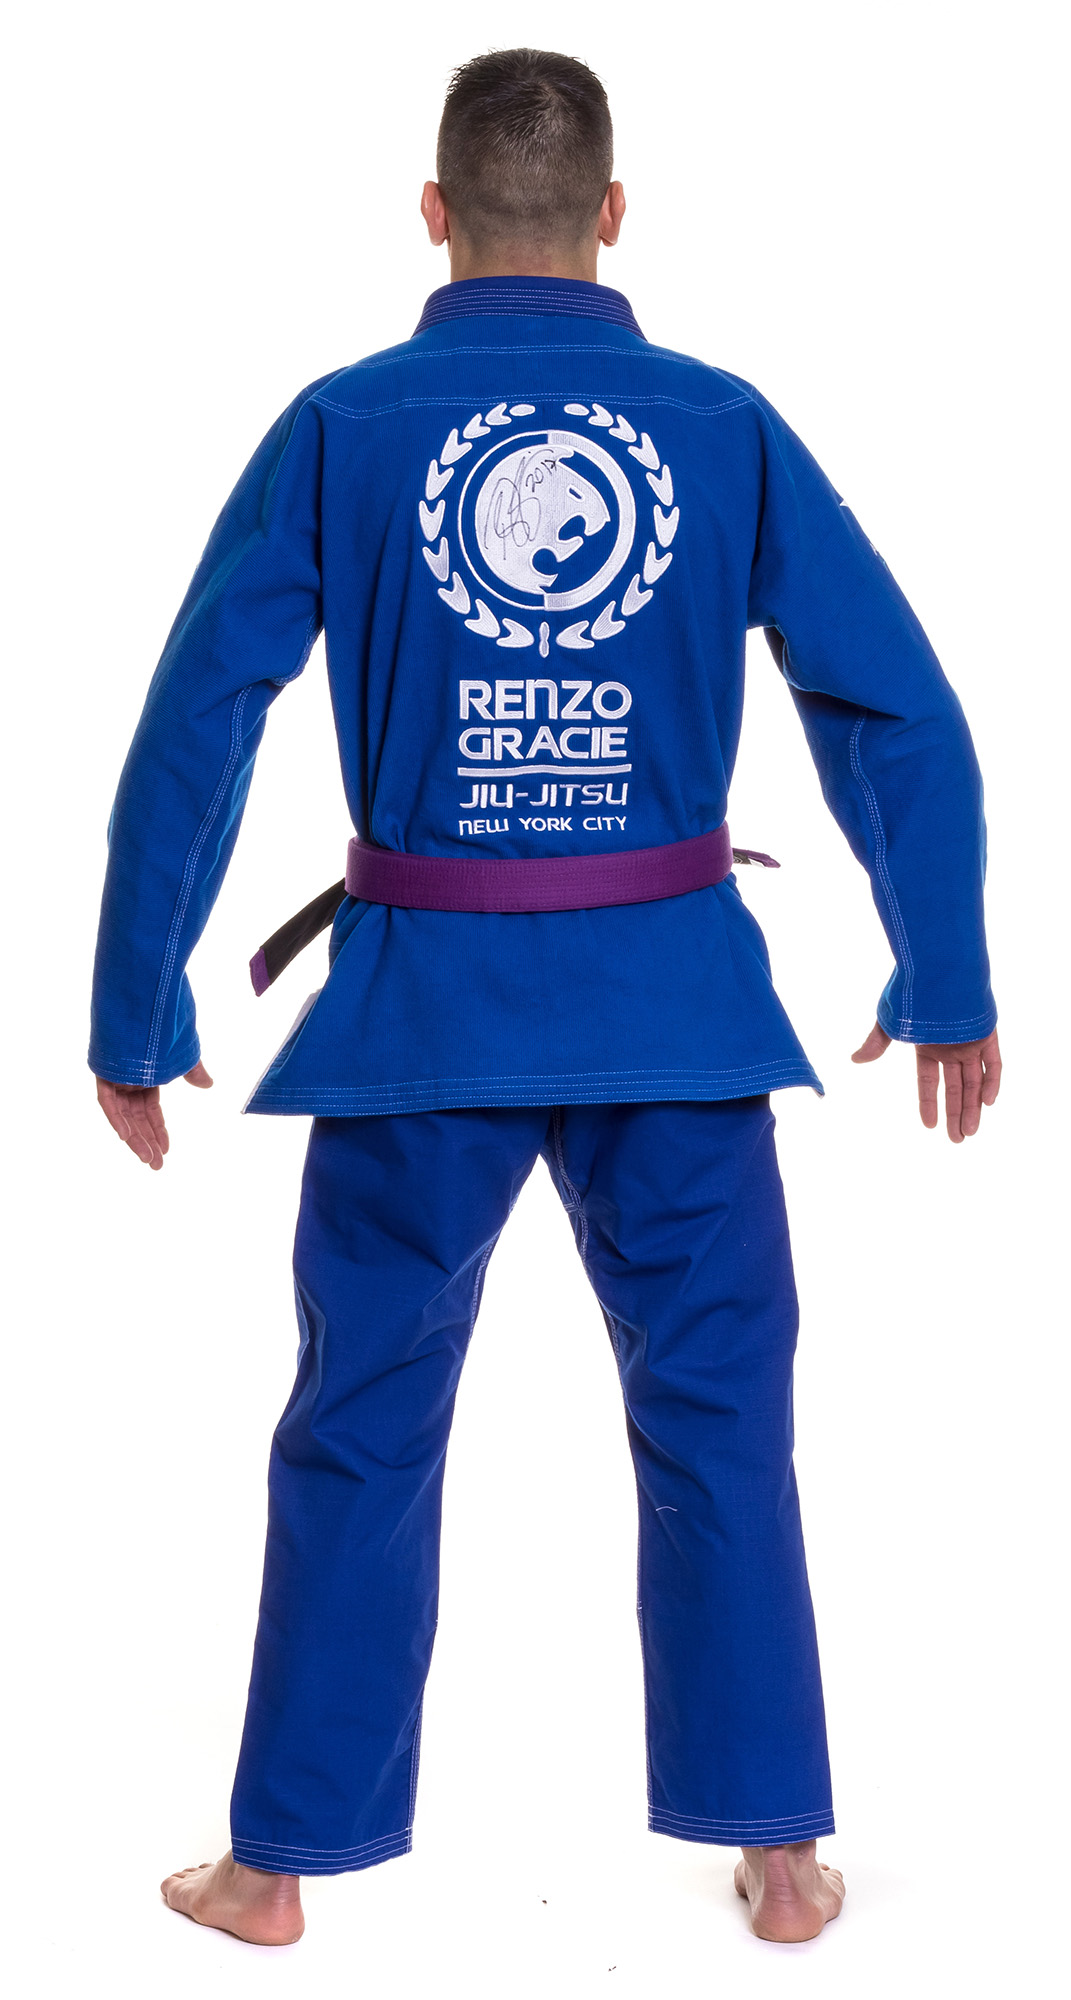 Renzo Gracie 2018 Limited Edition Collectors Gi